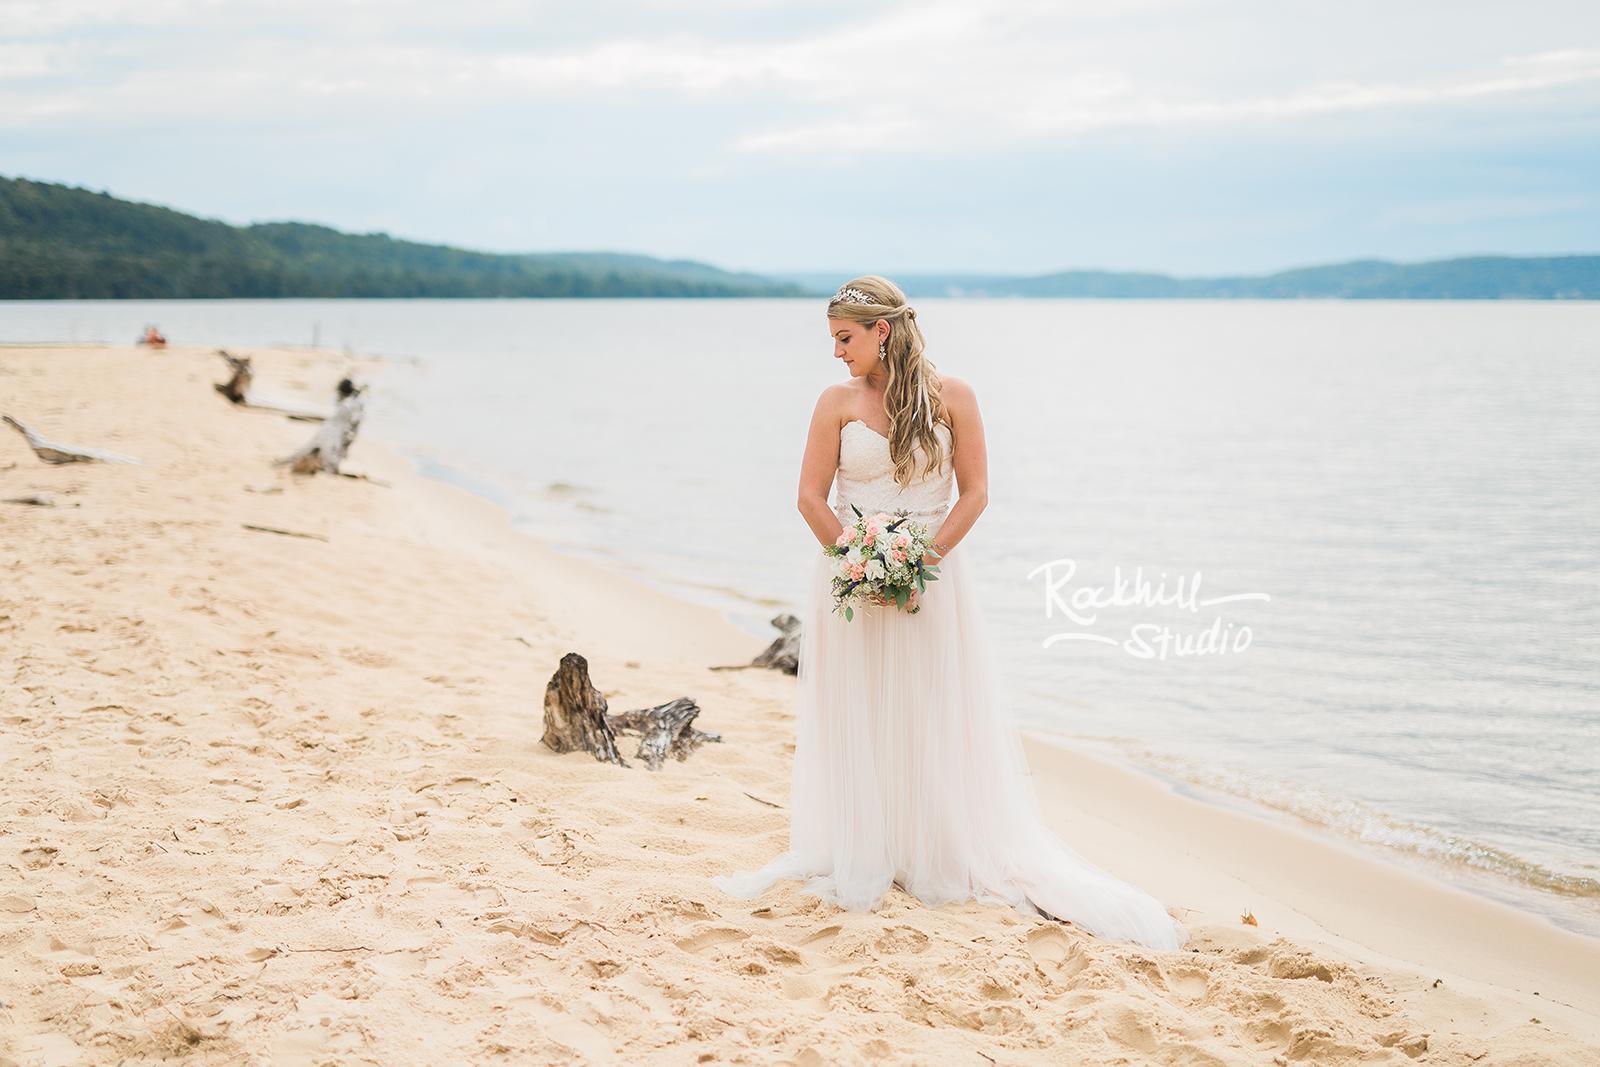 traverse city wedding photographer beach bride lake sand